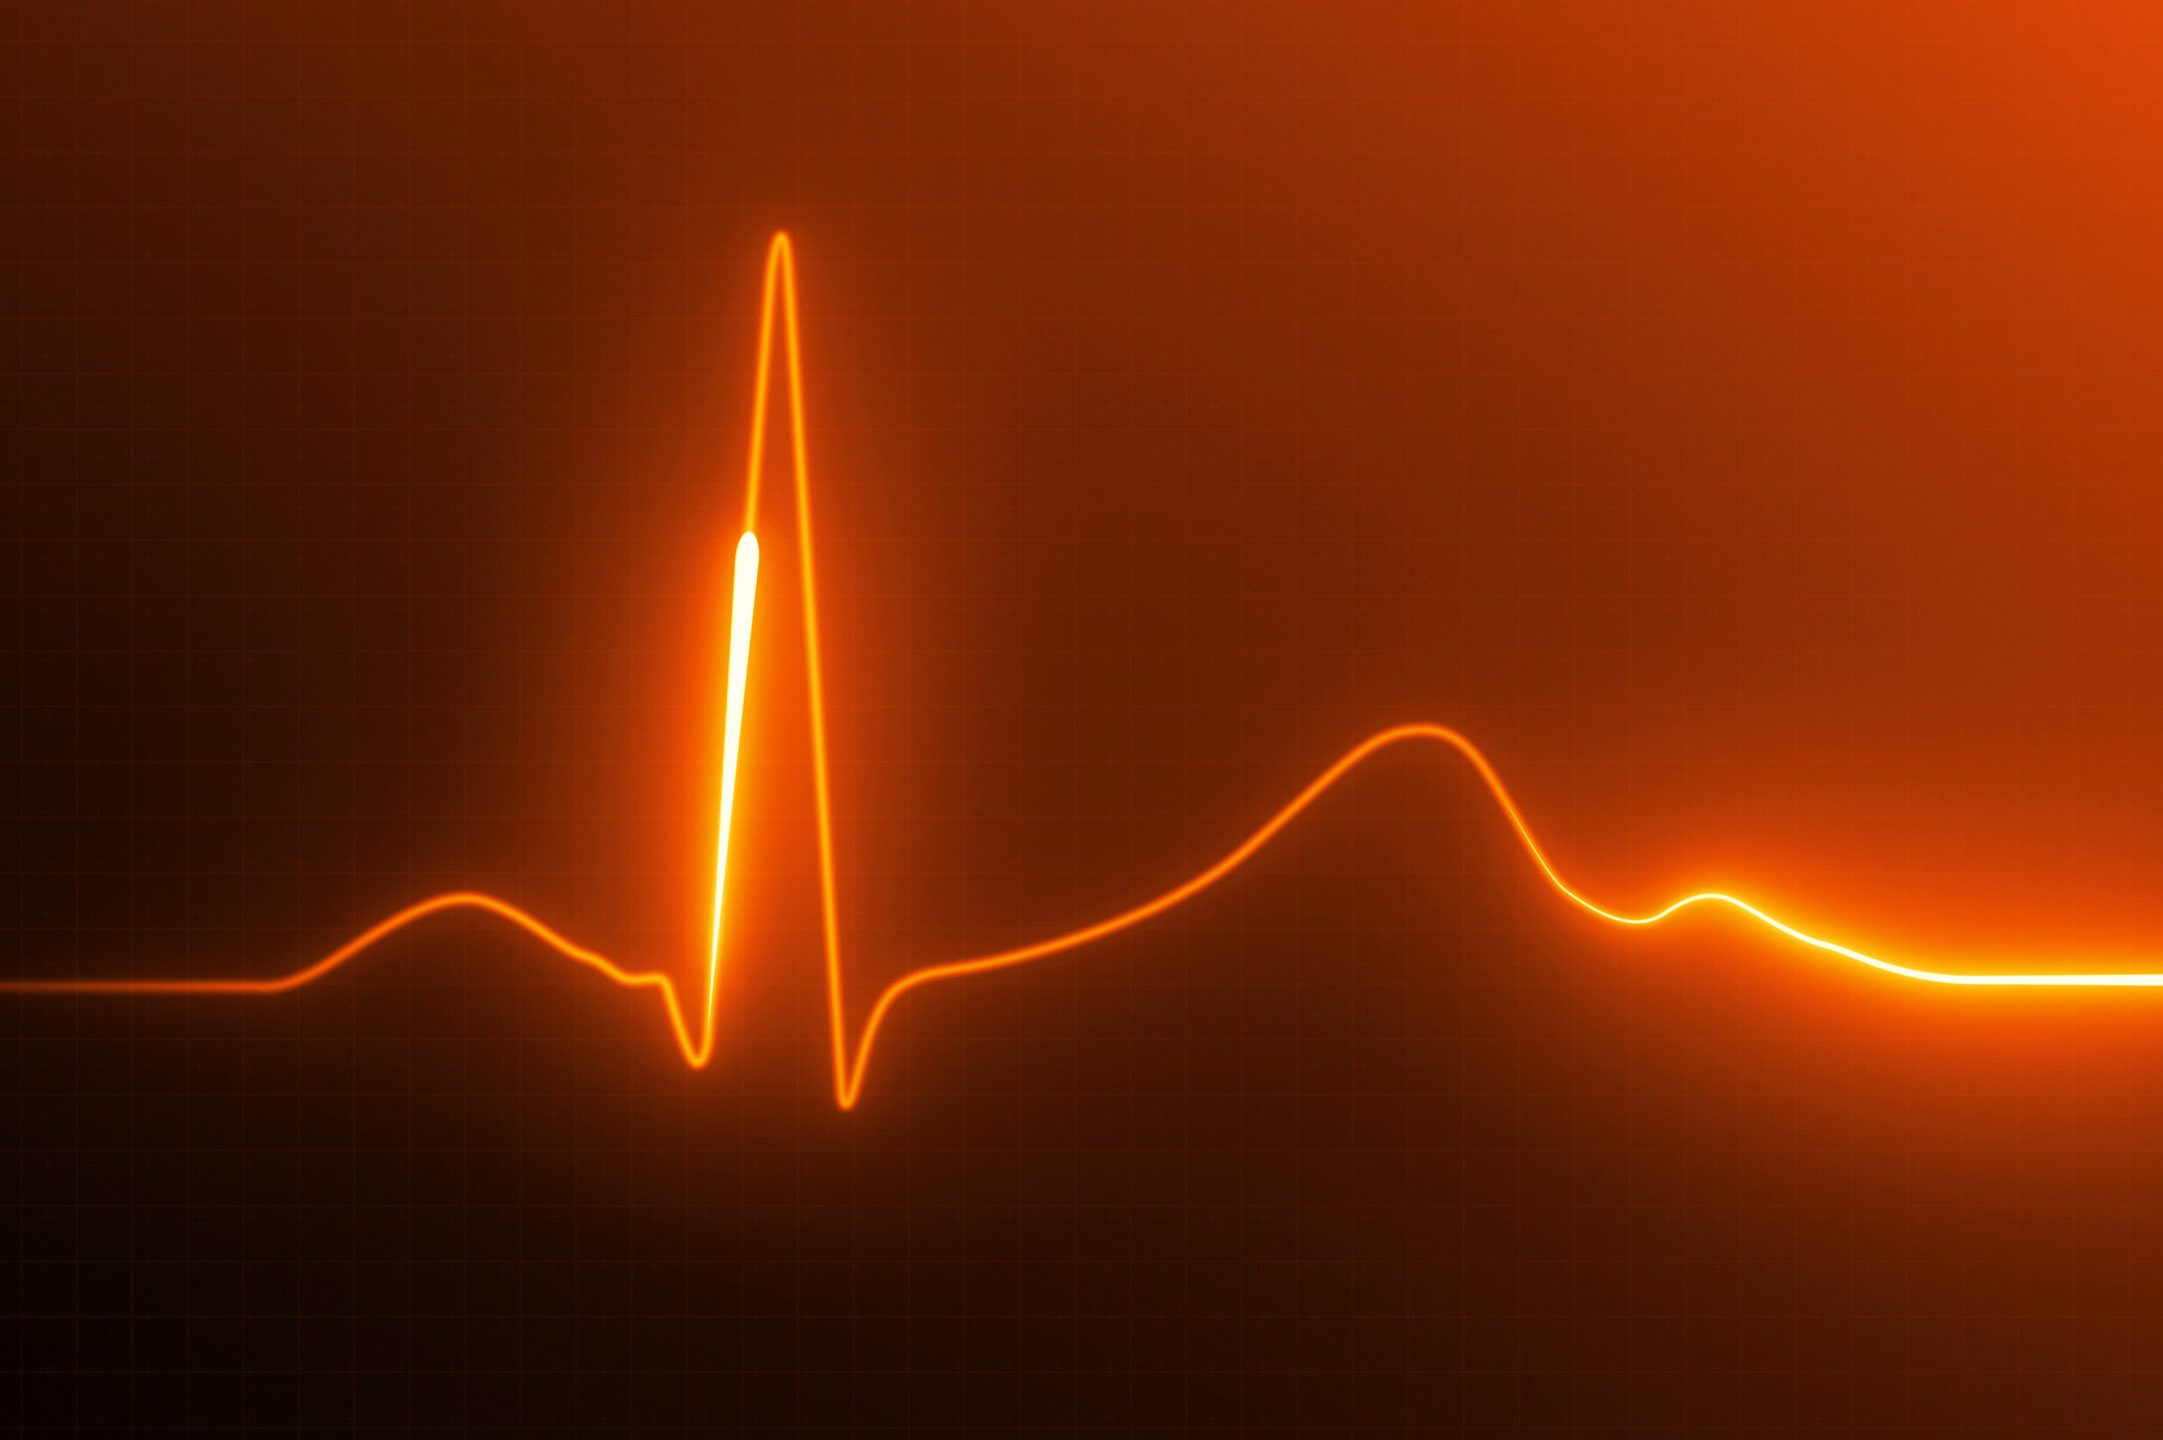 electrocardiogram heart rate image